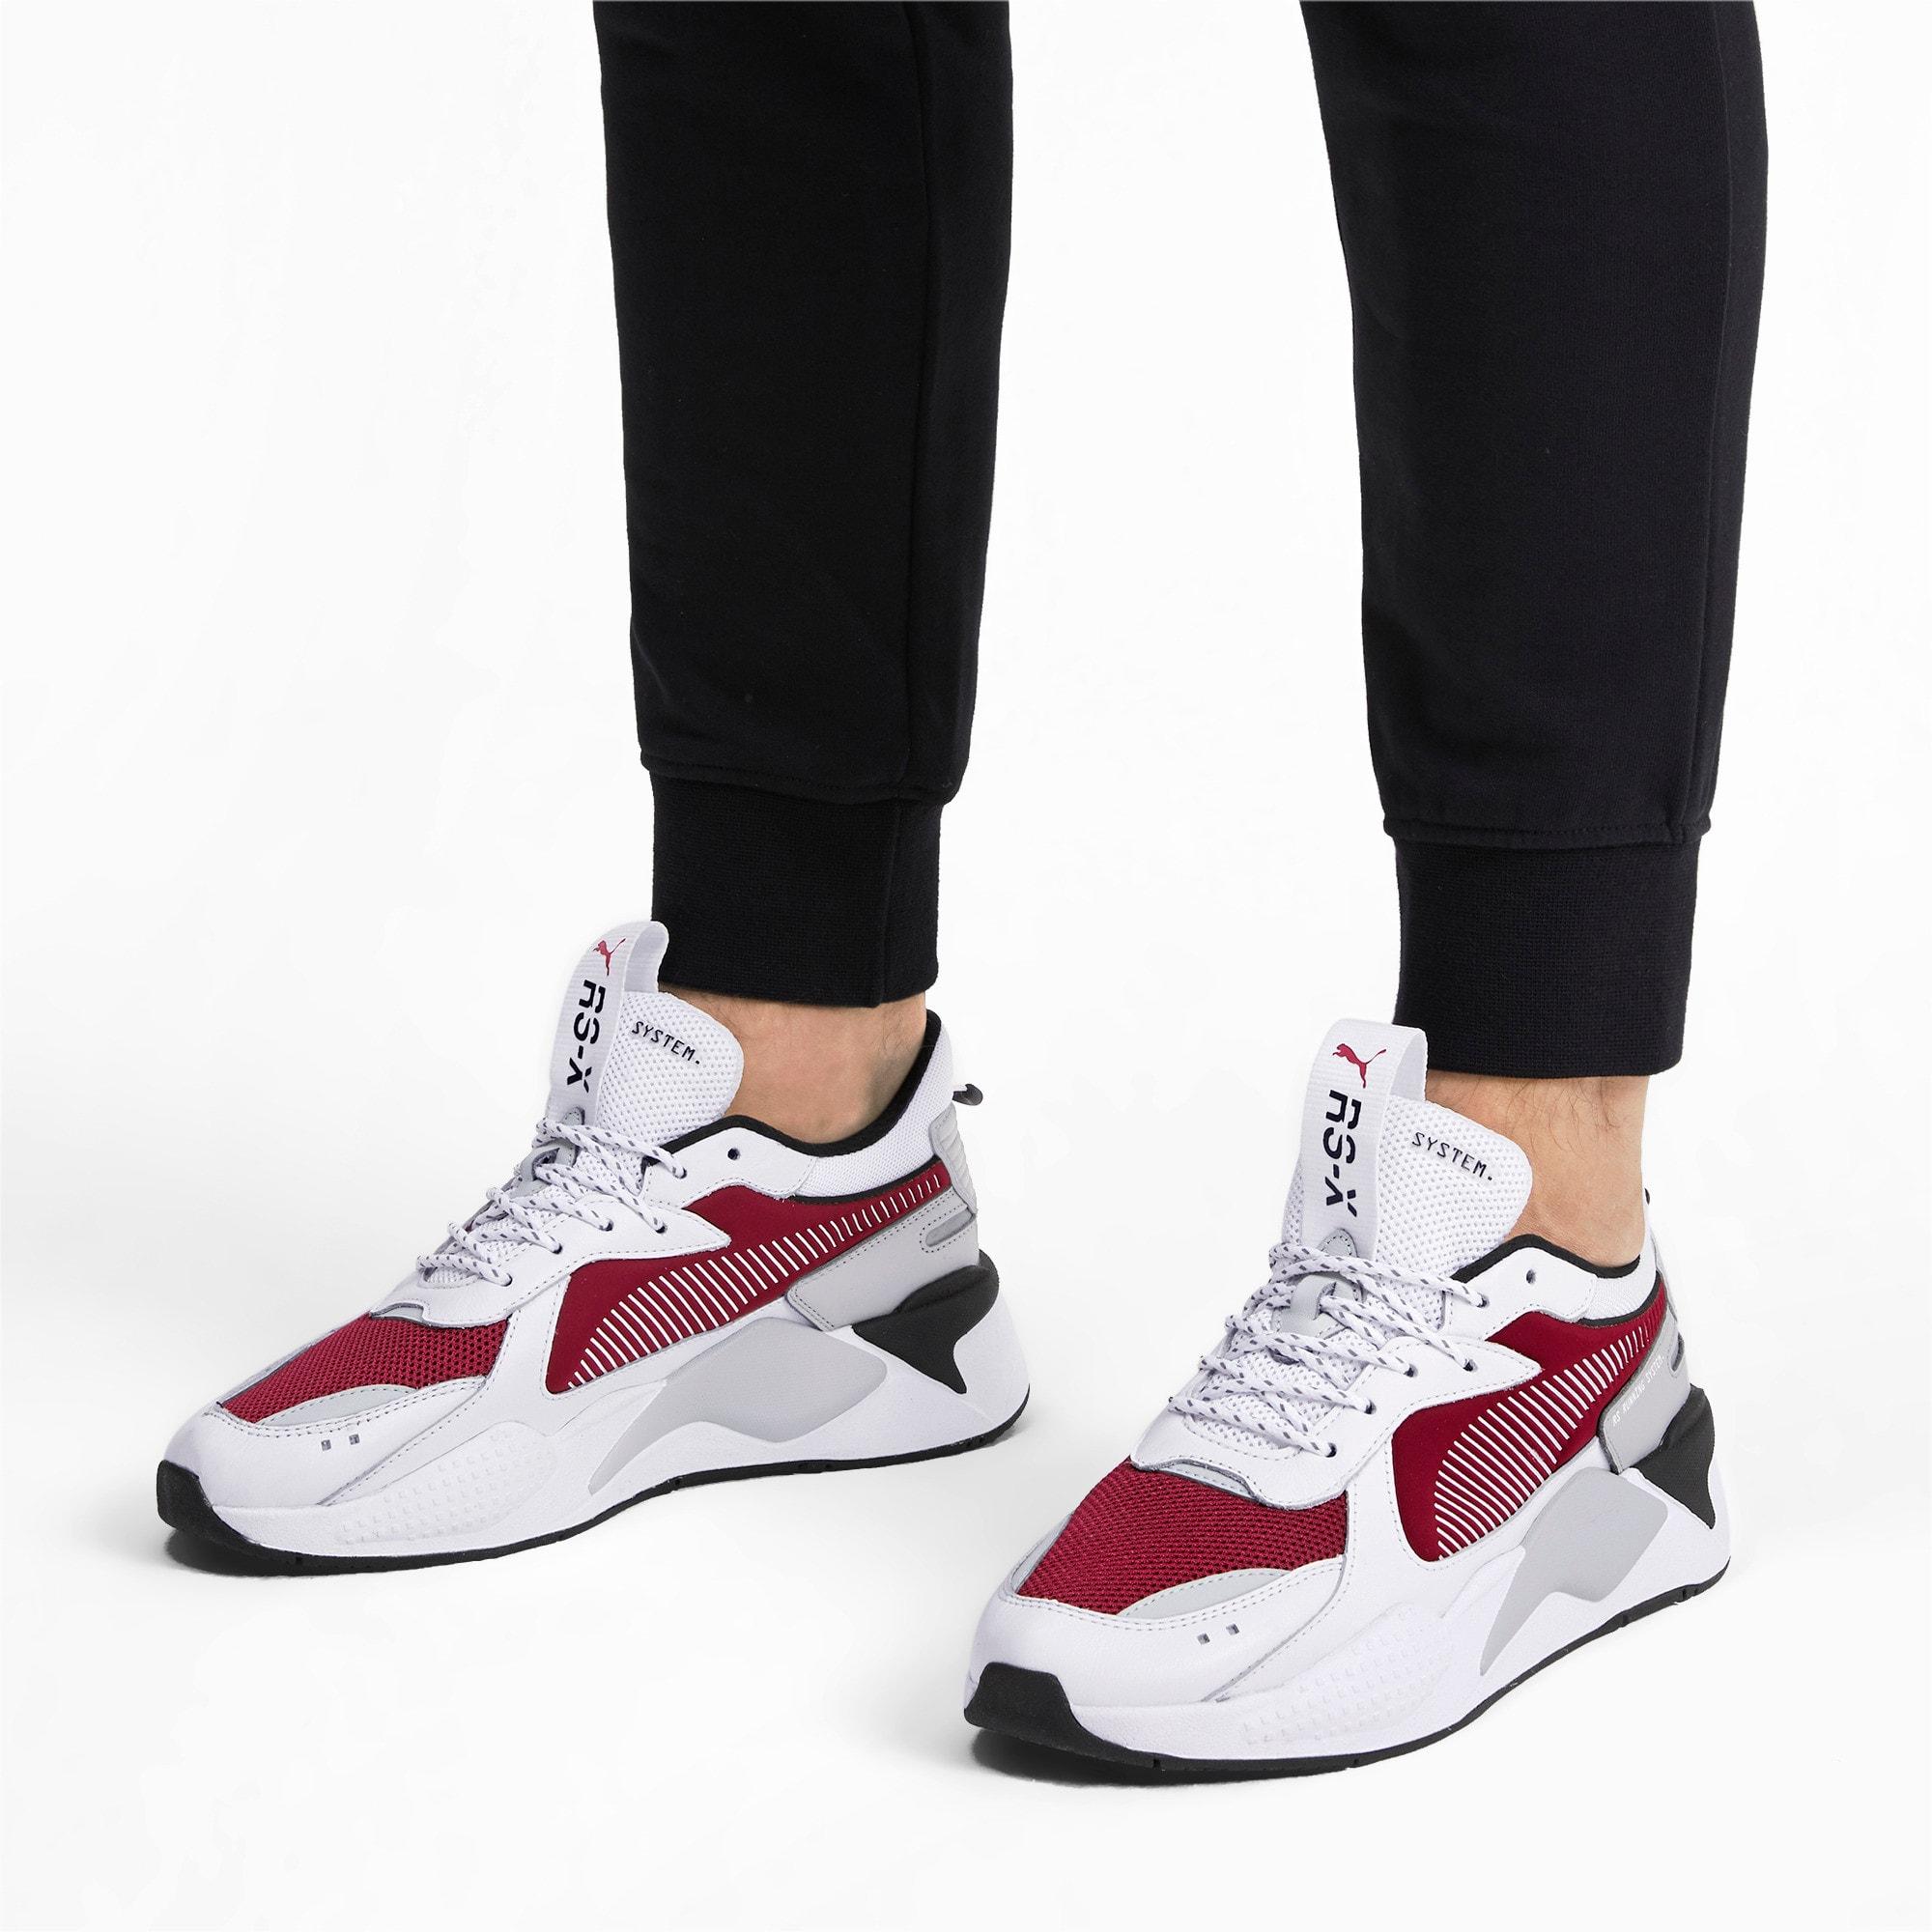 Thumbnail 2 of RS-X Core Sneakers, Puma White-Rhubarb, medium